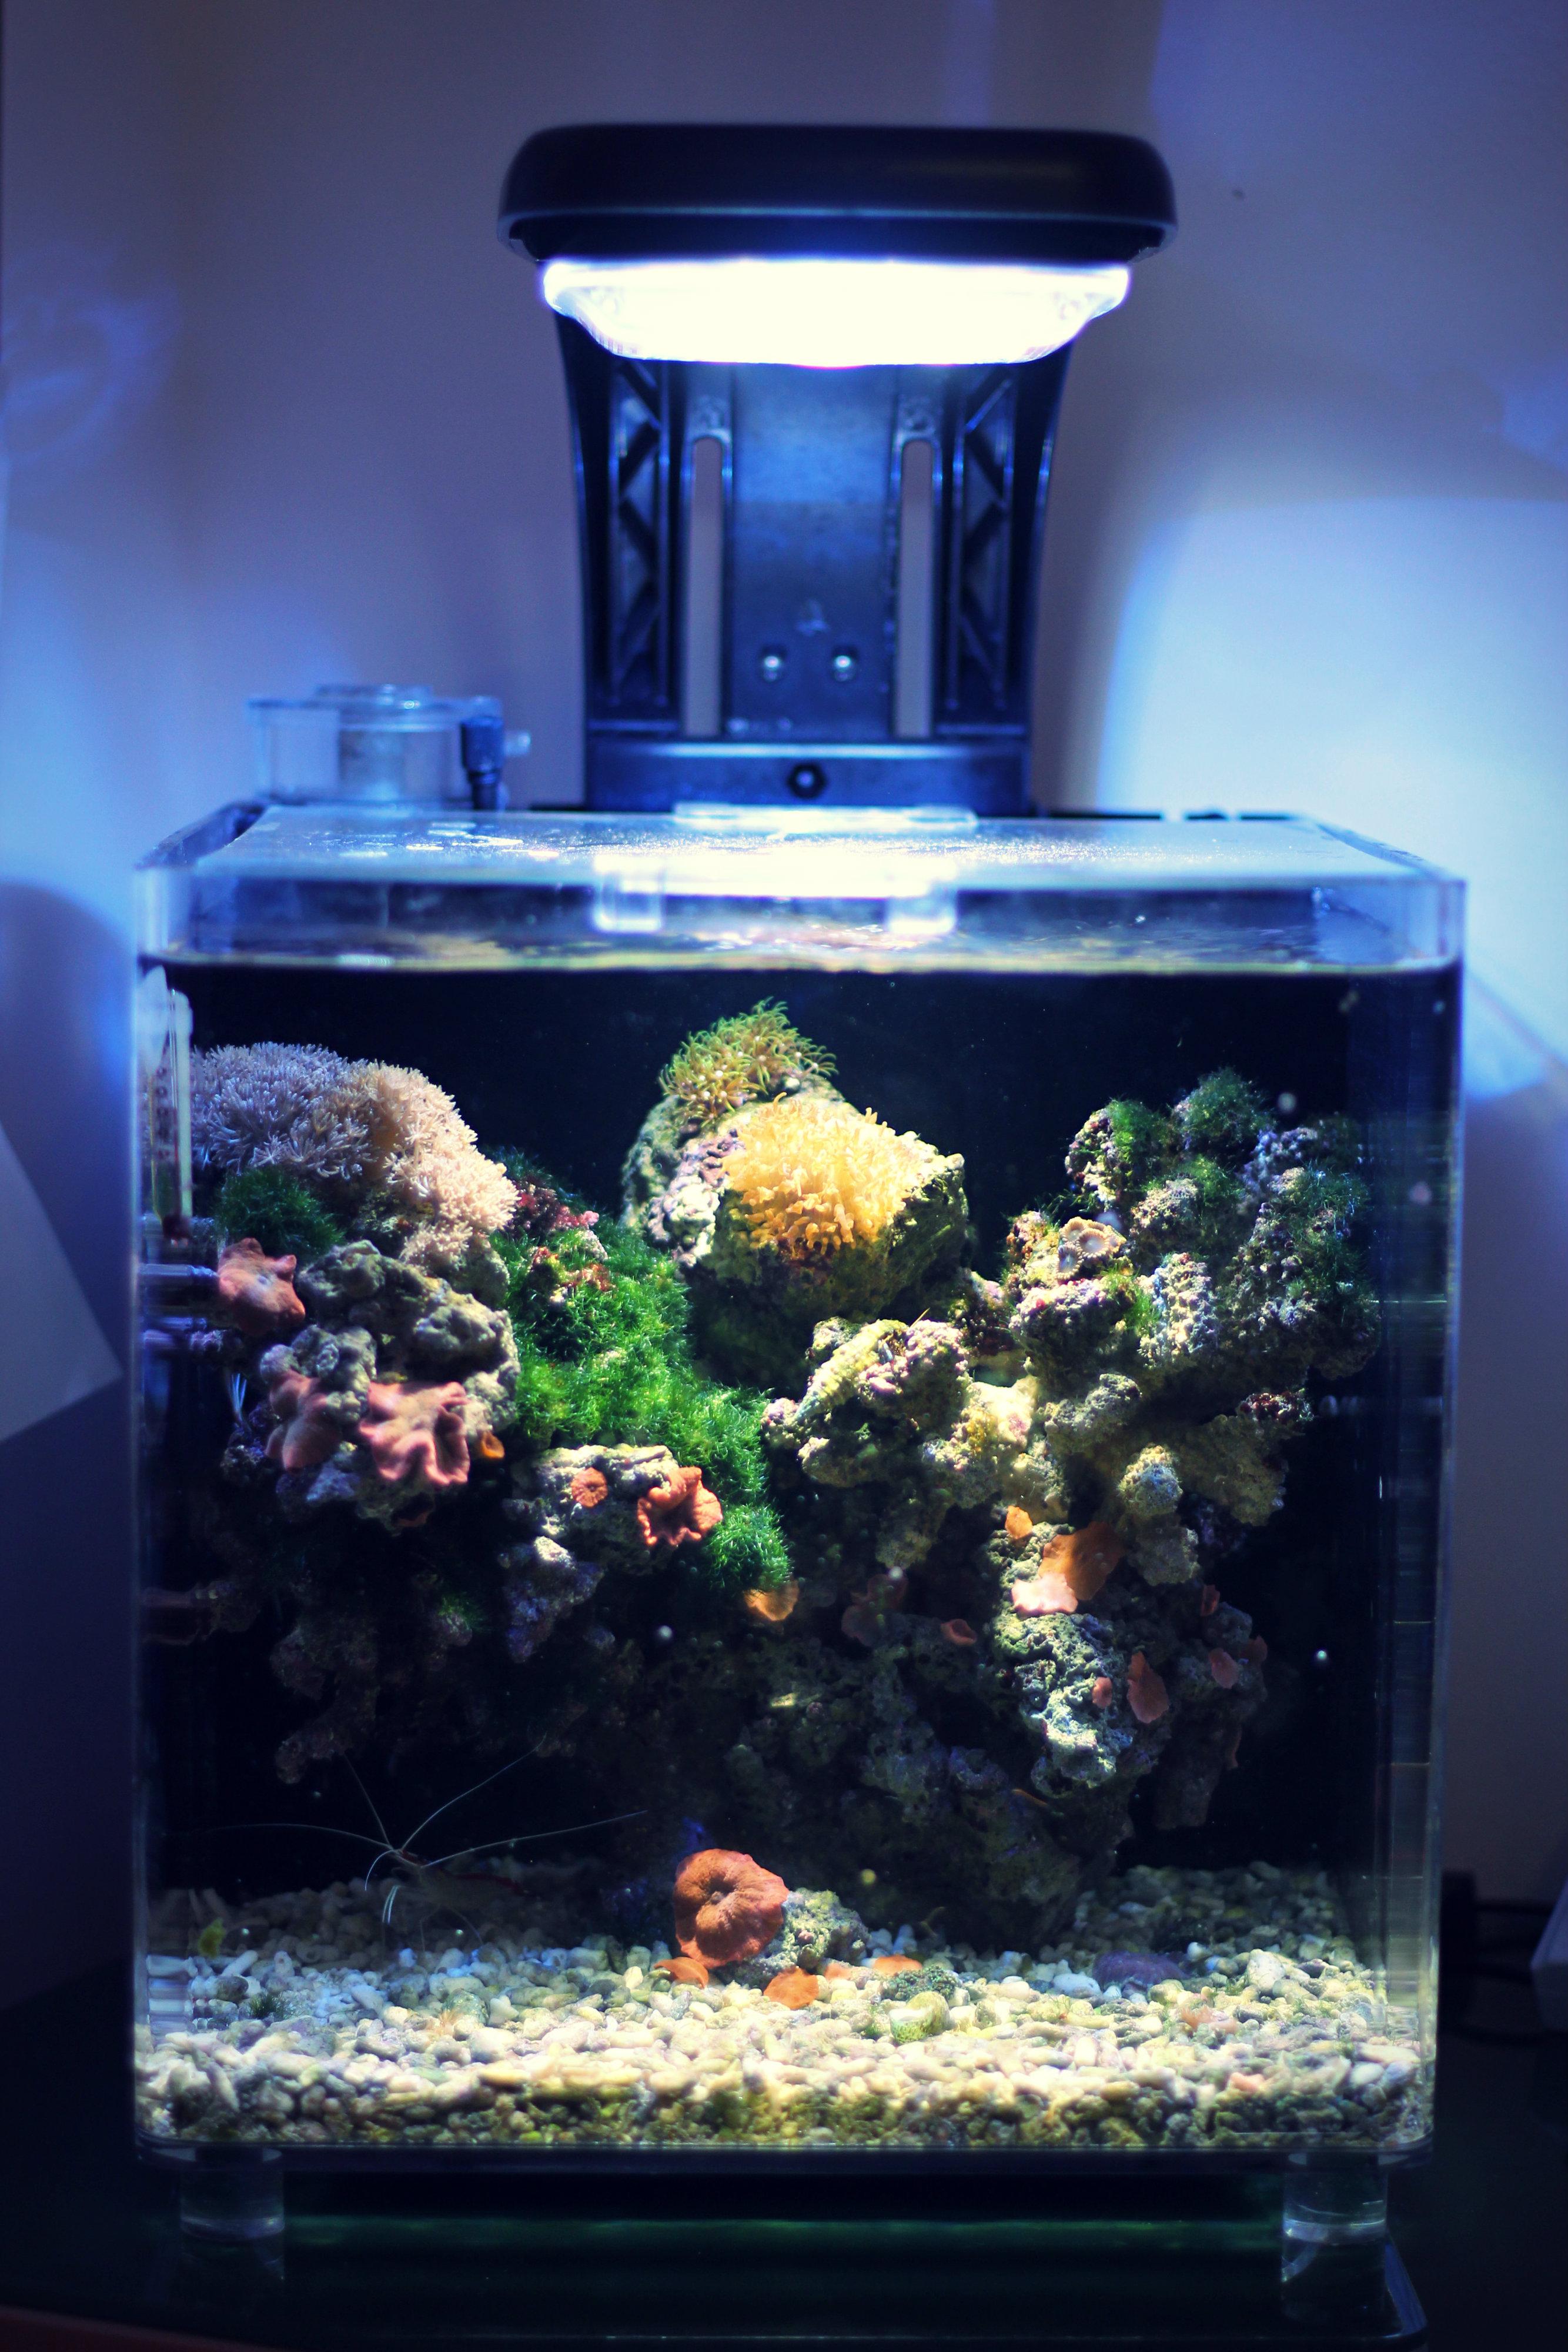 Xeat S Tmc Micro Habitat 30 Unter 100 Liter Dein